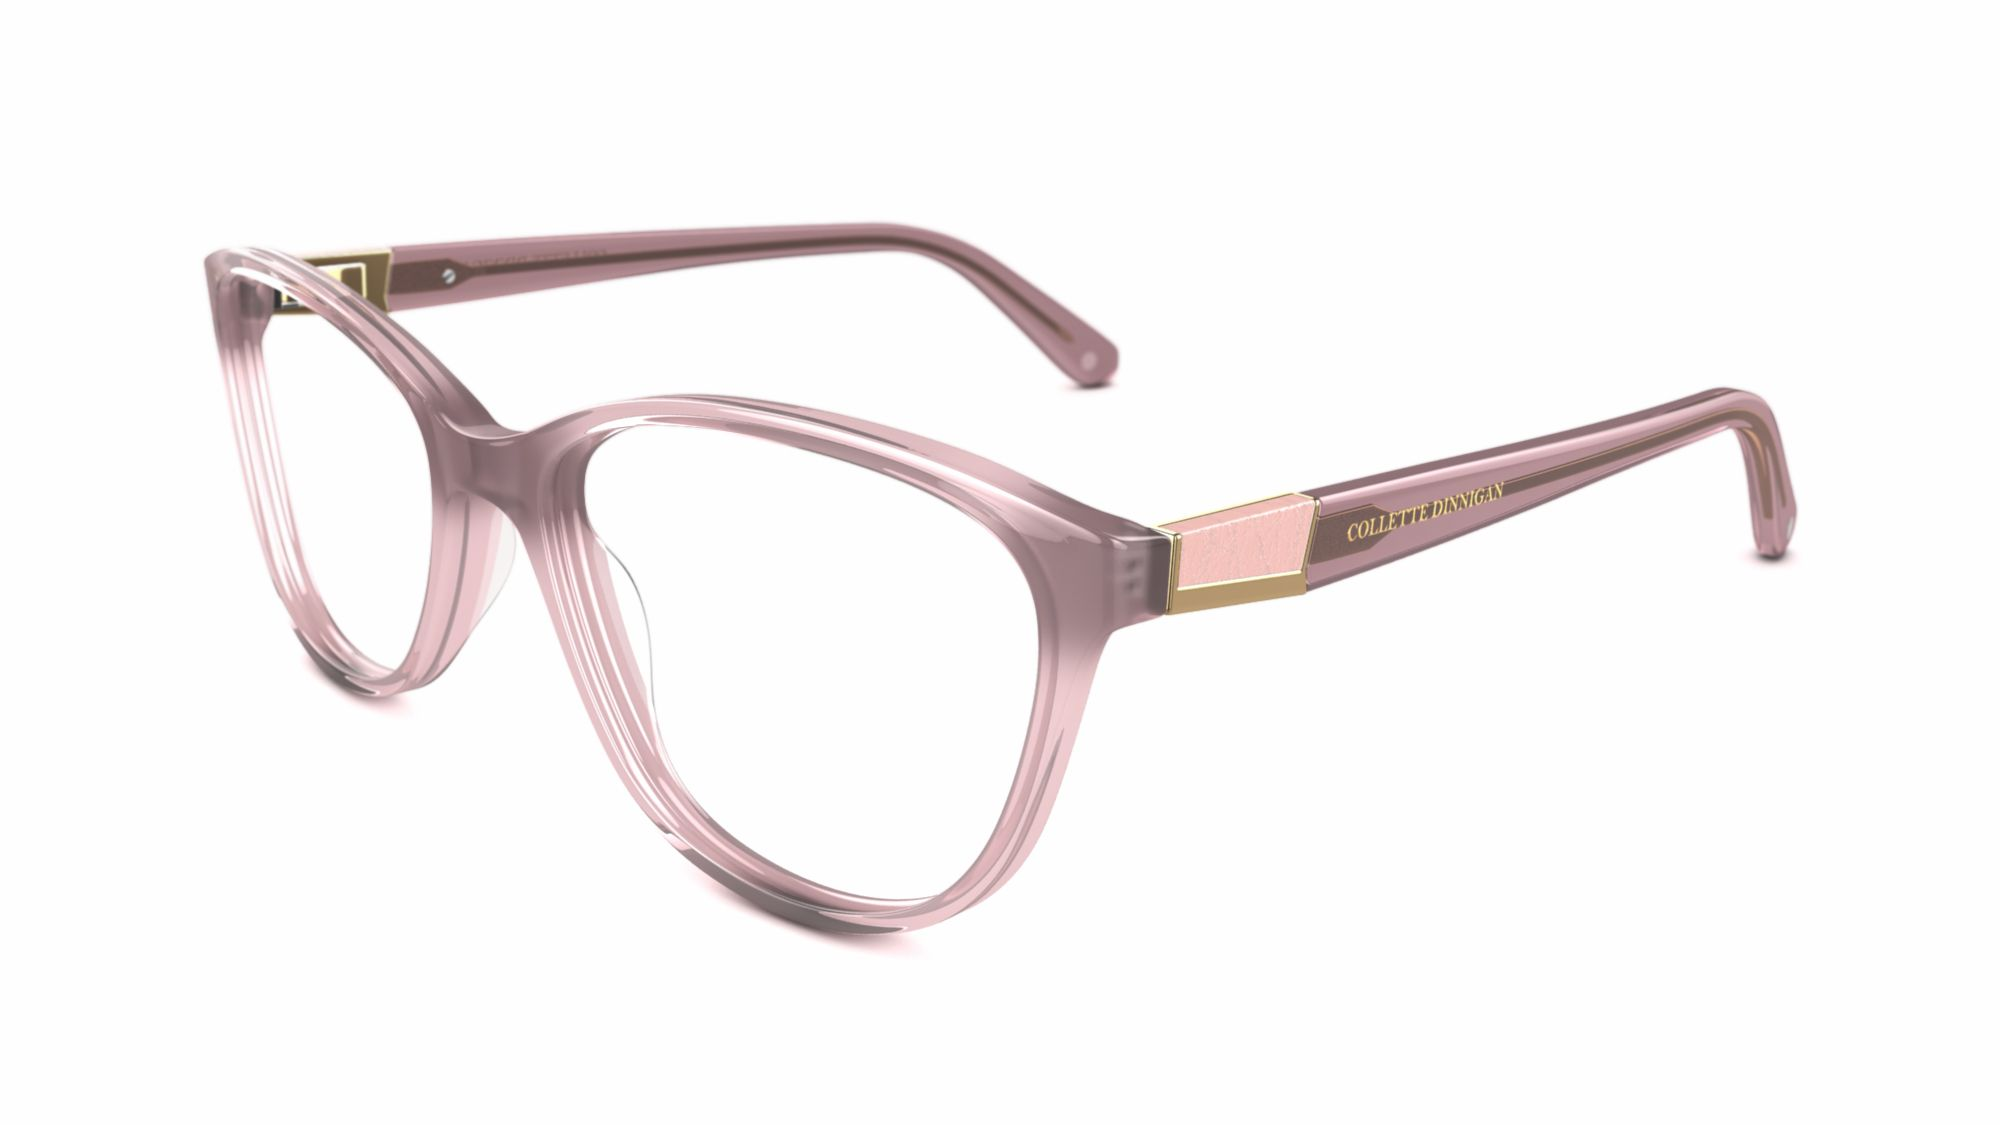 b64f84abca Collette Dinnigan glasses - C DINNIGAN 49